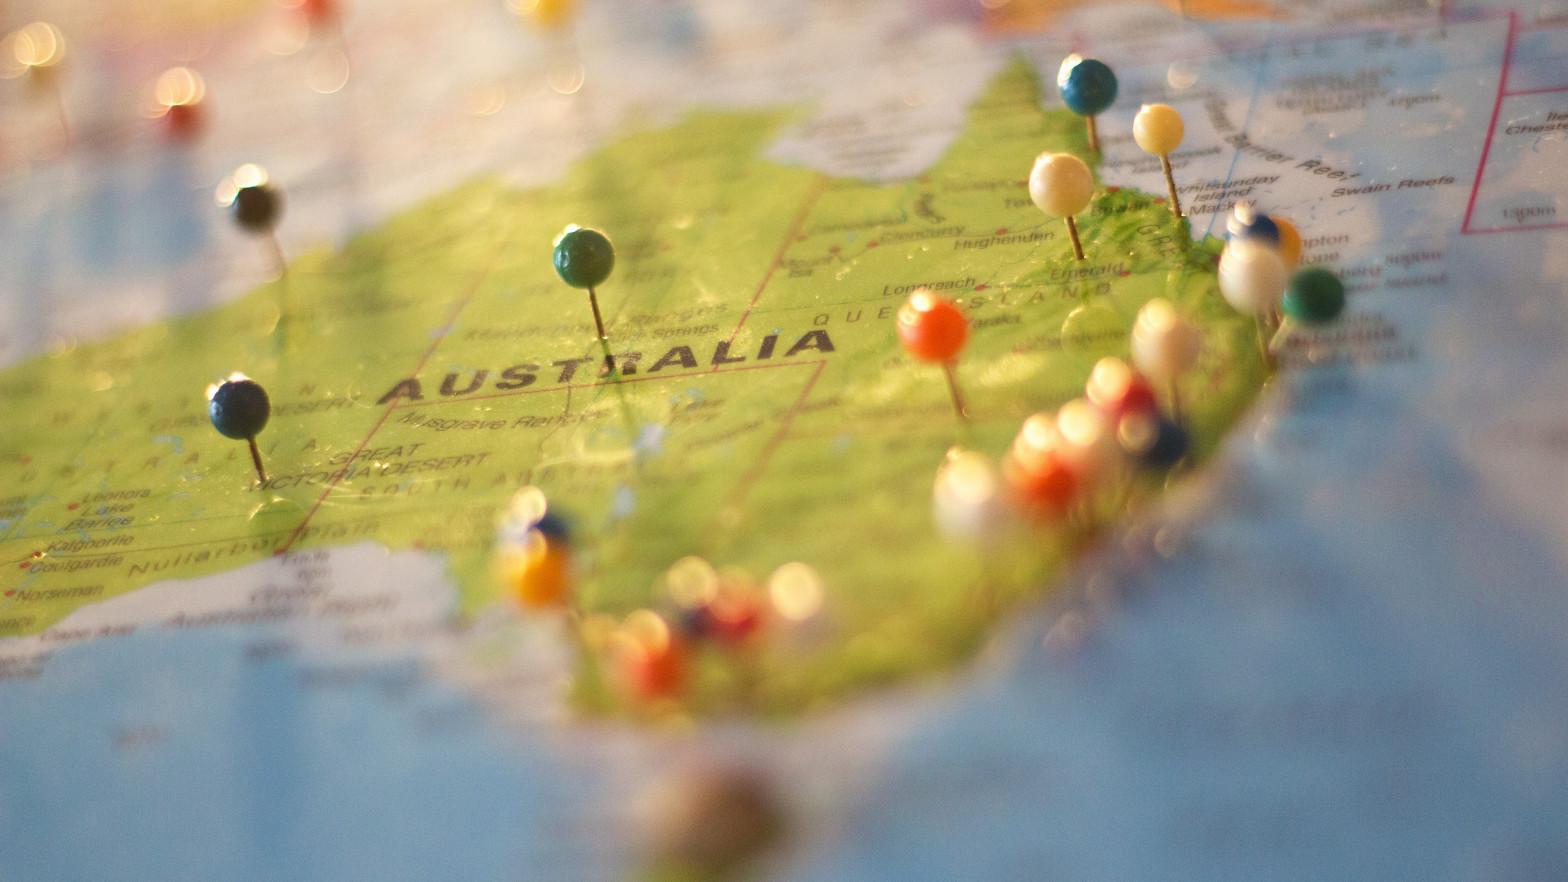 Australia rebaja tarifas aéreas domésticas para impulsar el turismo nacional